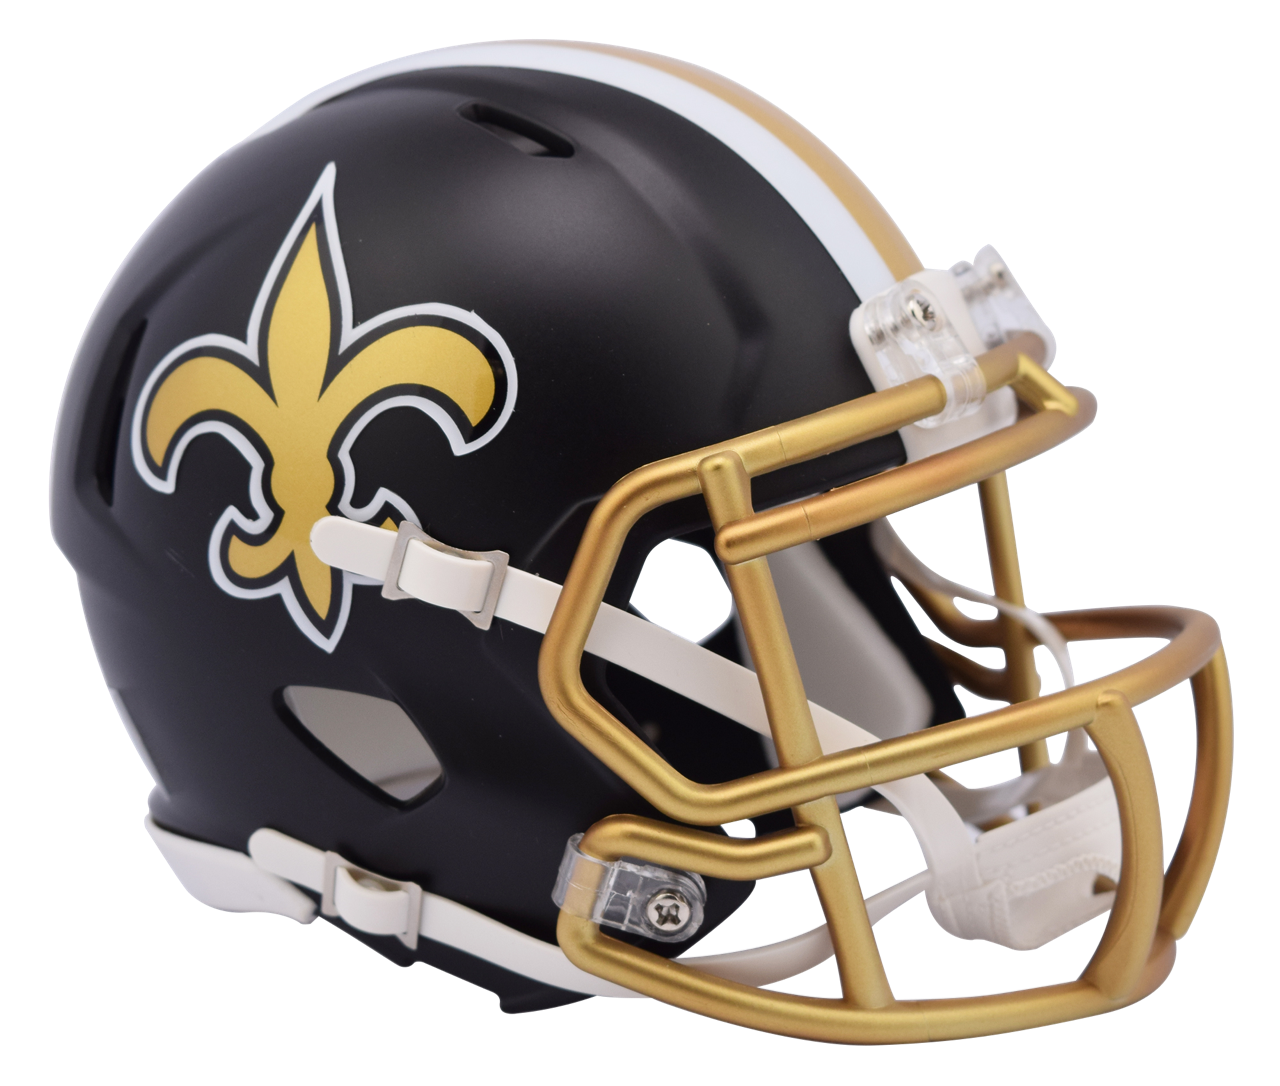 83175946b76 ... New Orleans Saints NFL Blaze Revolution Speed Riddell Mini Football  Helmet. Image 1. Image 1